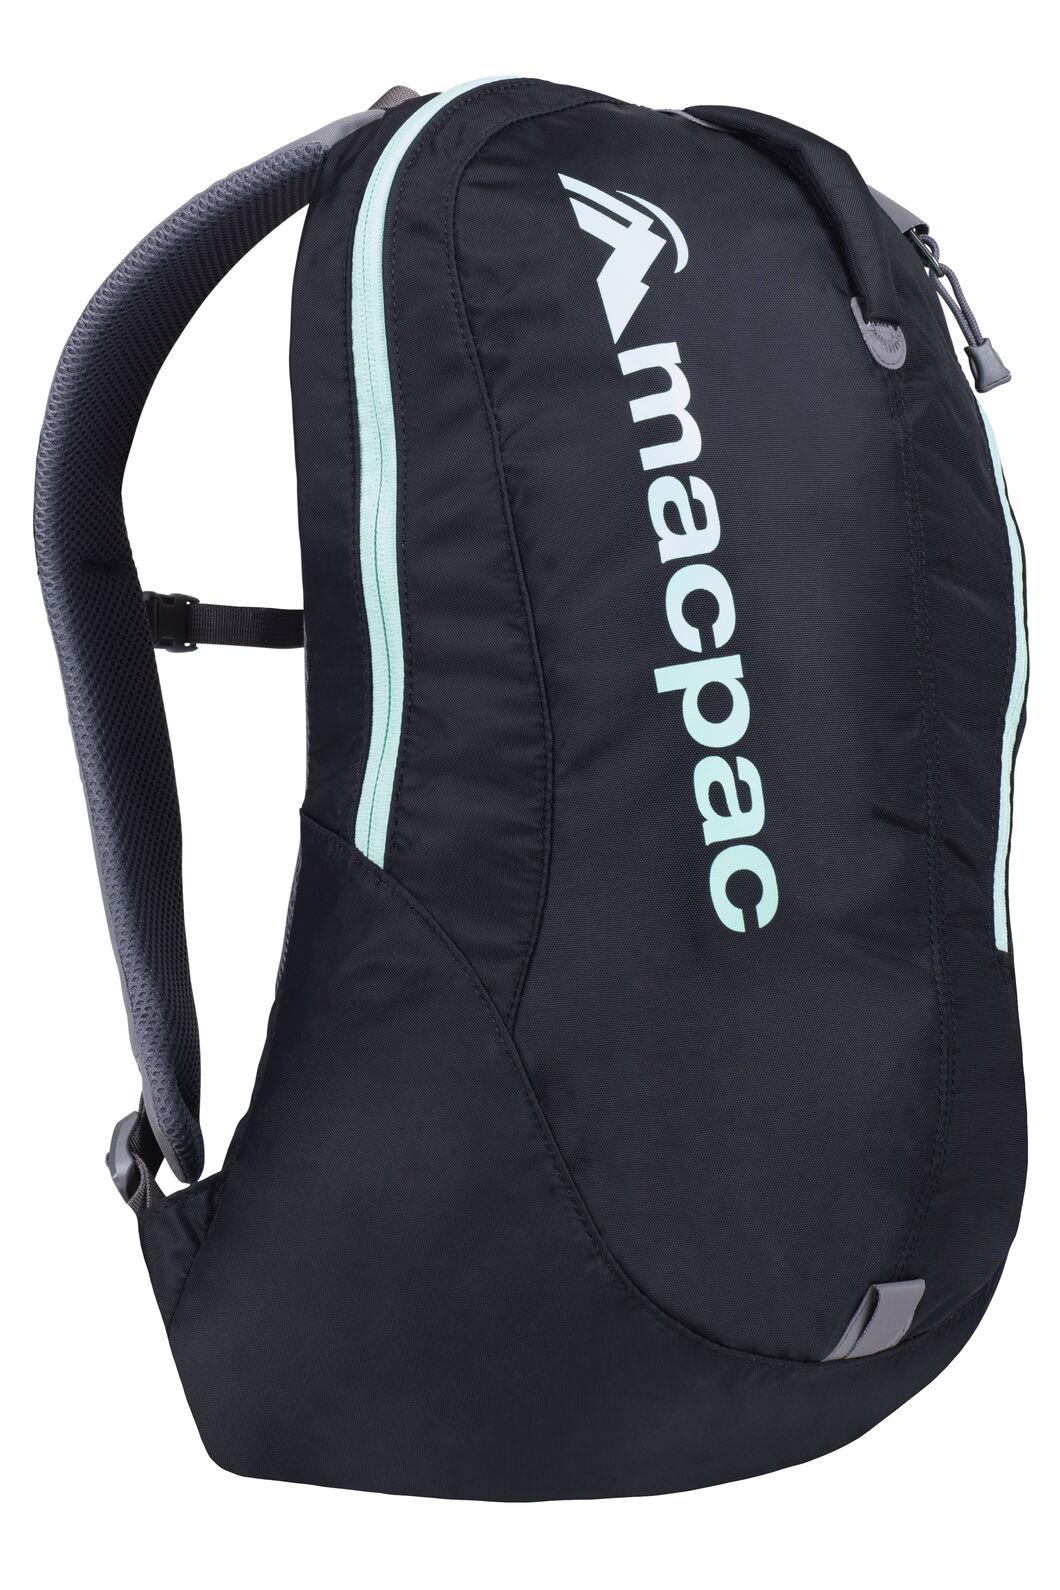 Kahuna 1.1 18L Backpack, Black/Ice Green, hi-res